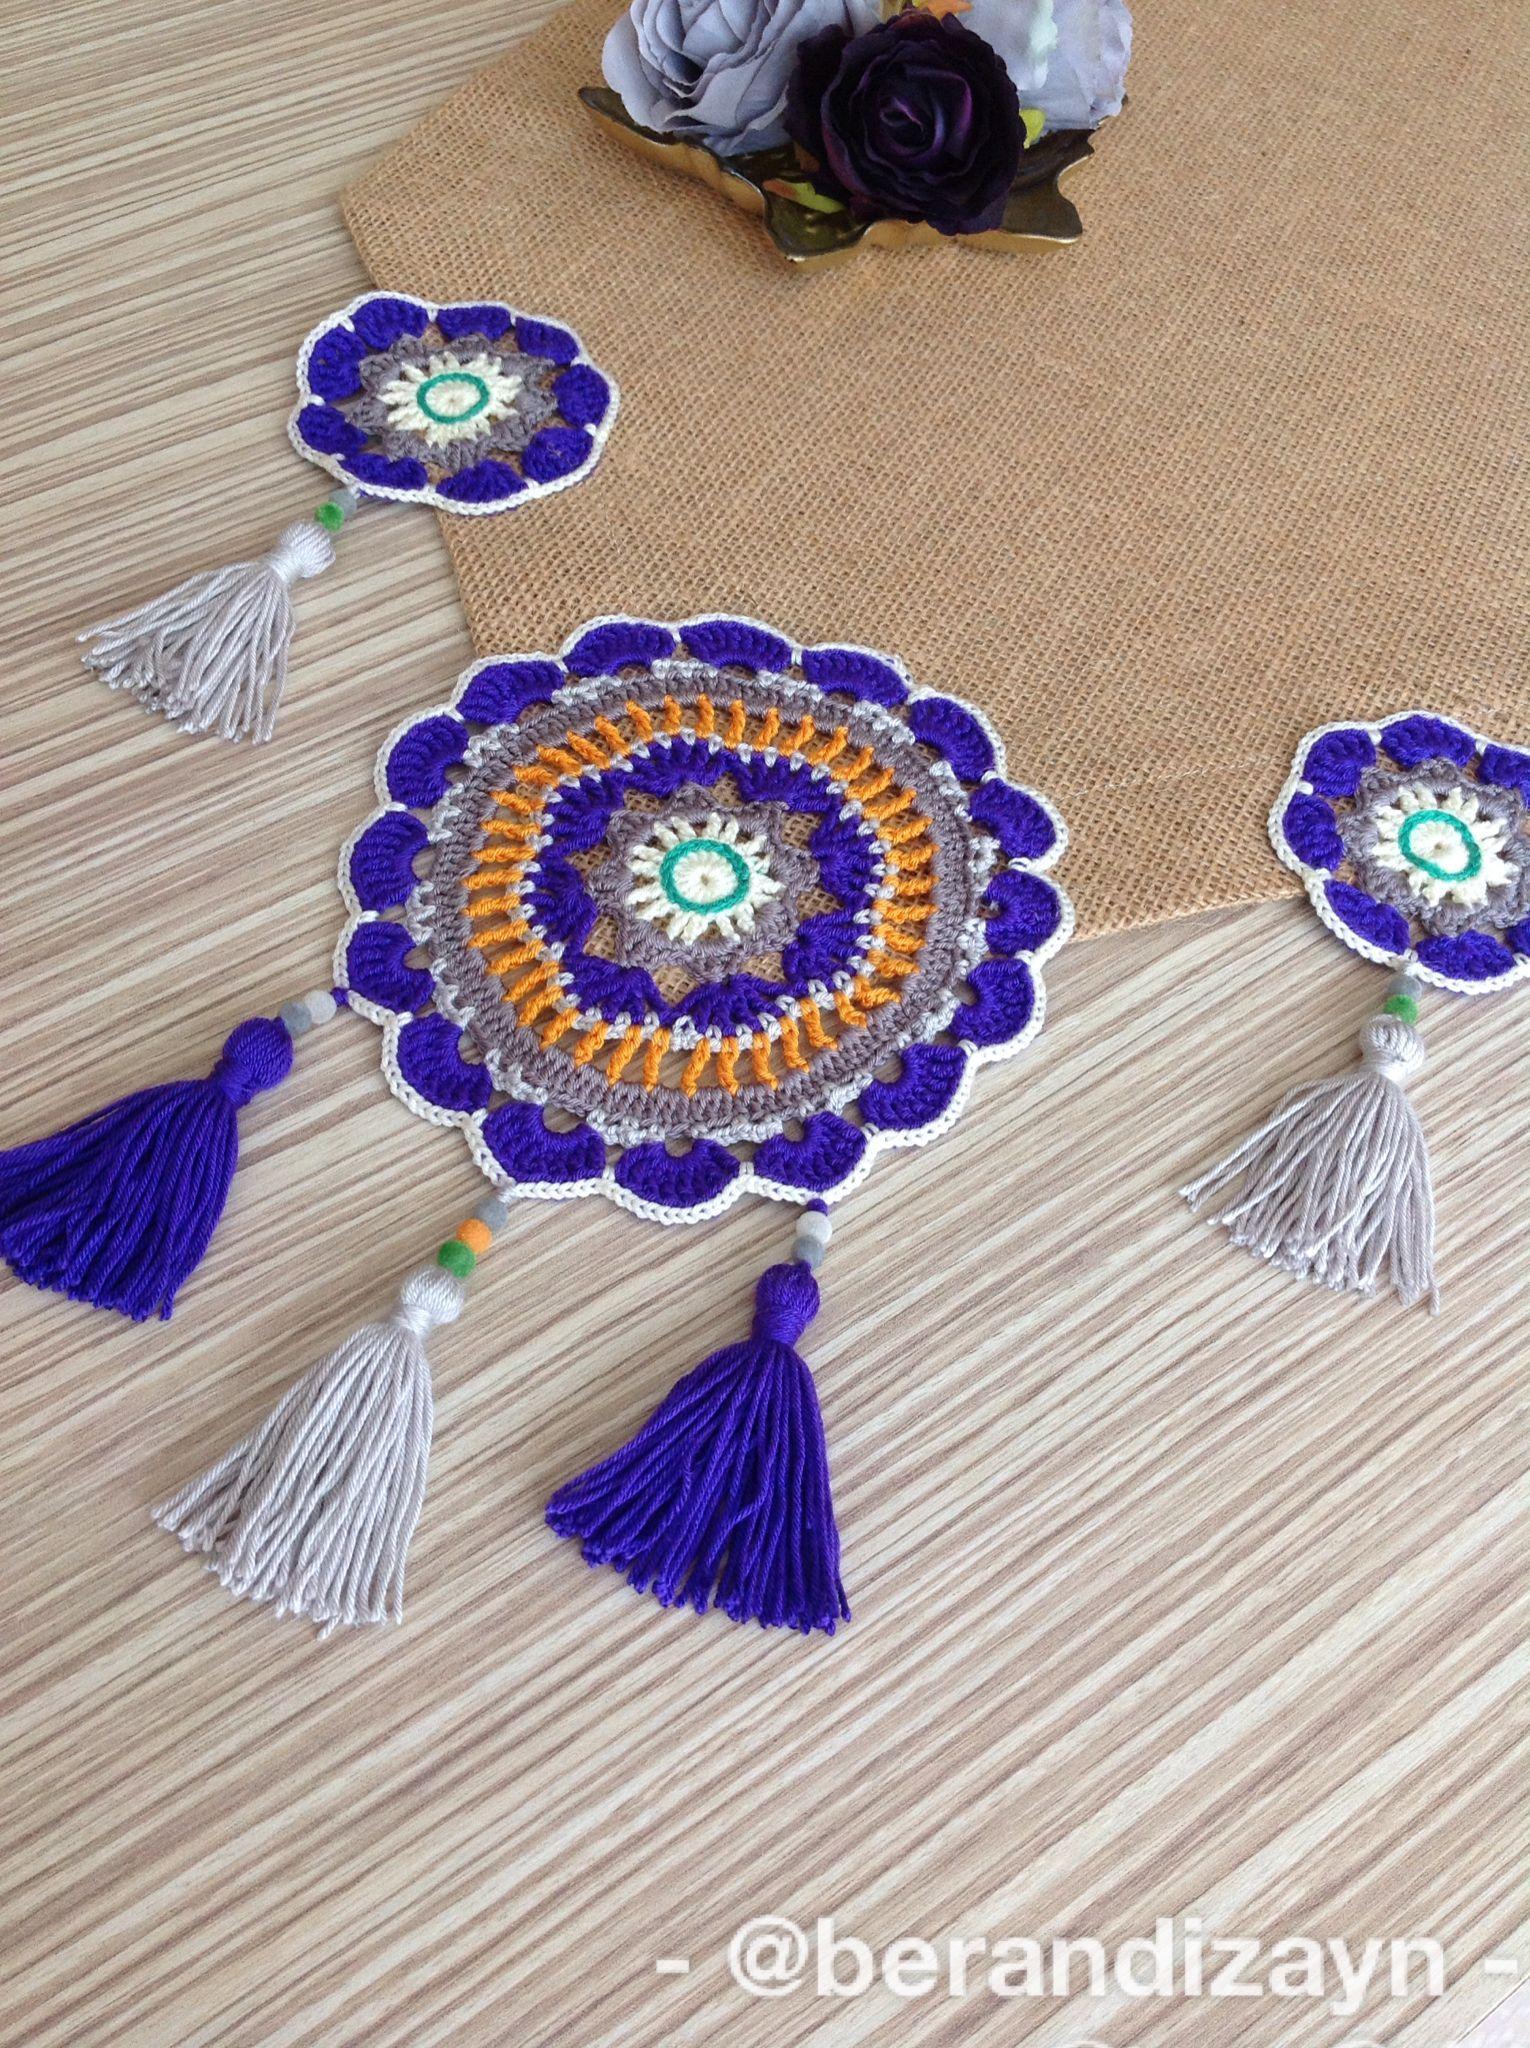 Ceyiz Crochet Knitting Mandala Motif Ortusu Runner Sehpa Runner Mandala Motif Sehpa Ortusu Knitting Crochet Ceyiz In 2020 Stricken Decke Tischdecke